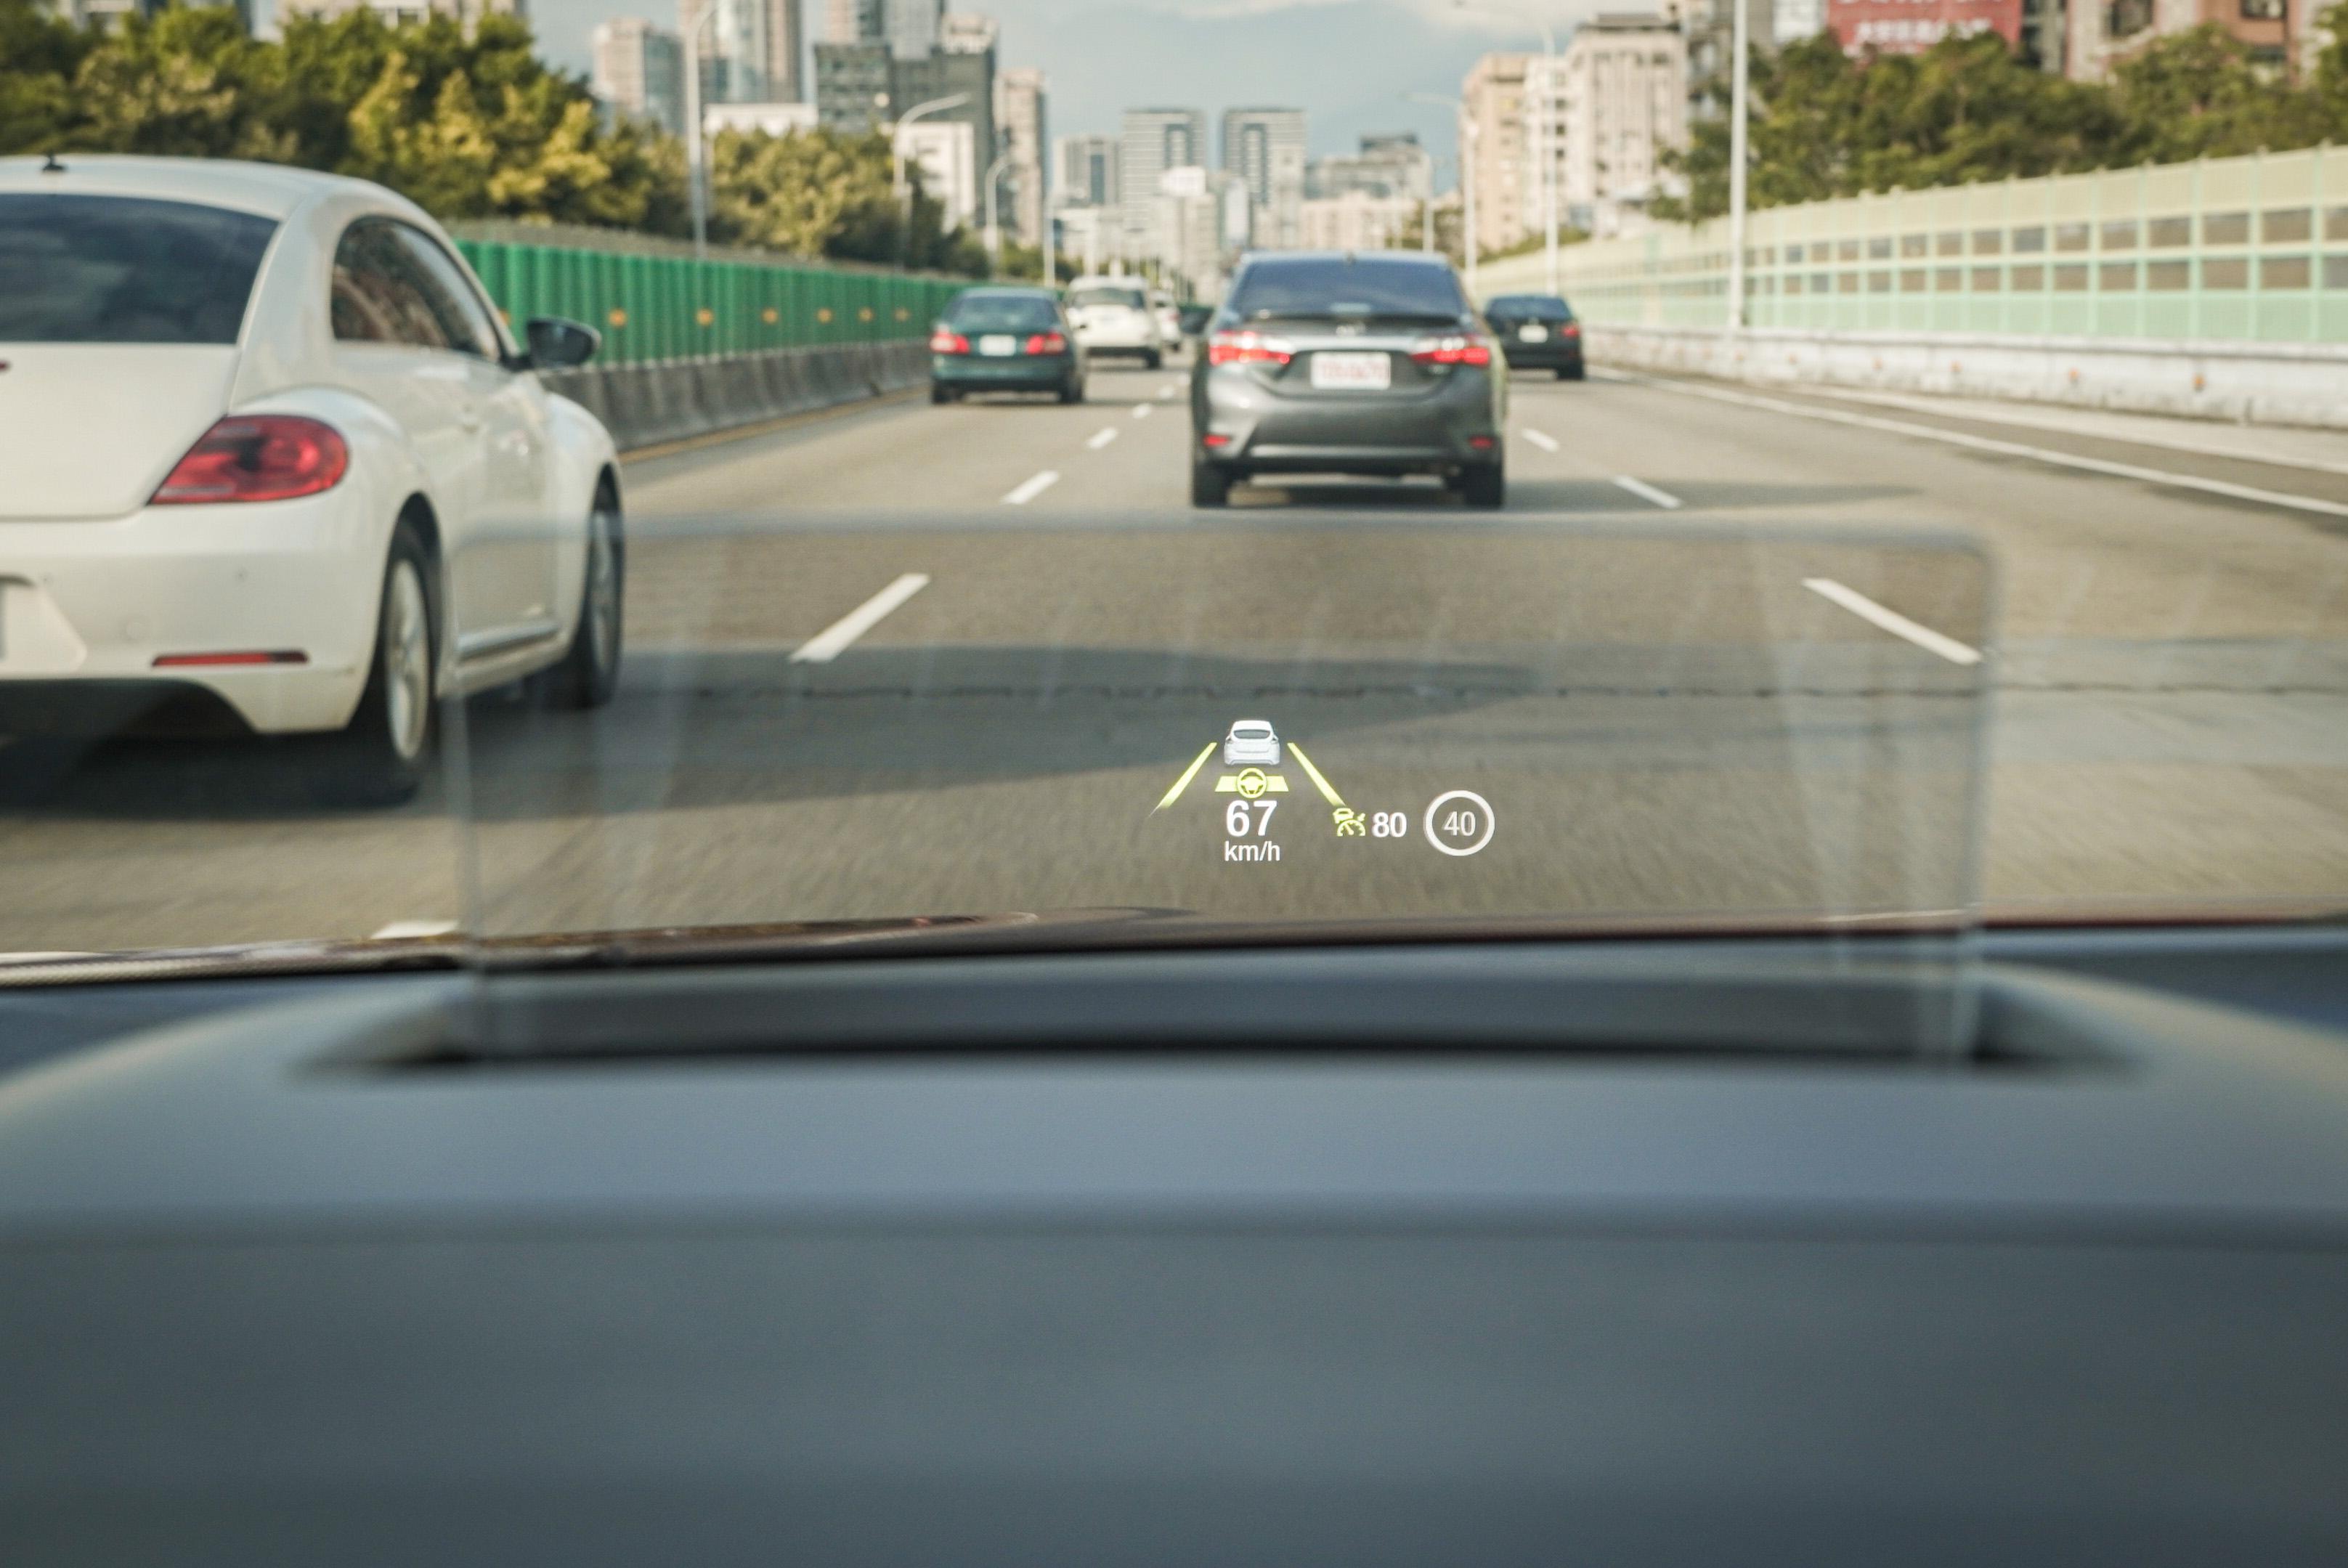 HUD 智慧型抬頭顯示器可顯示 Level 2 資訊。